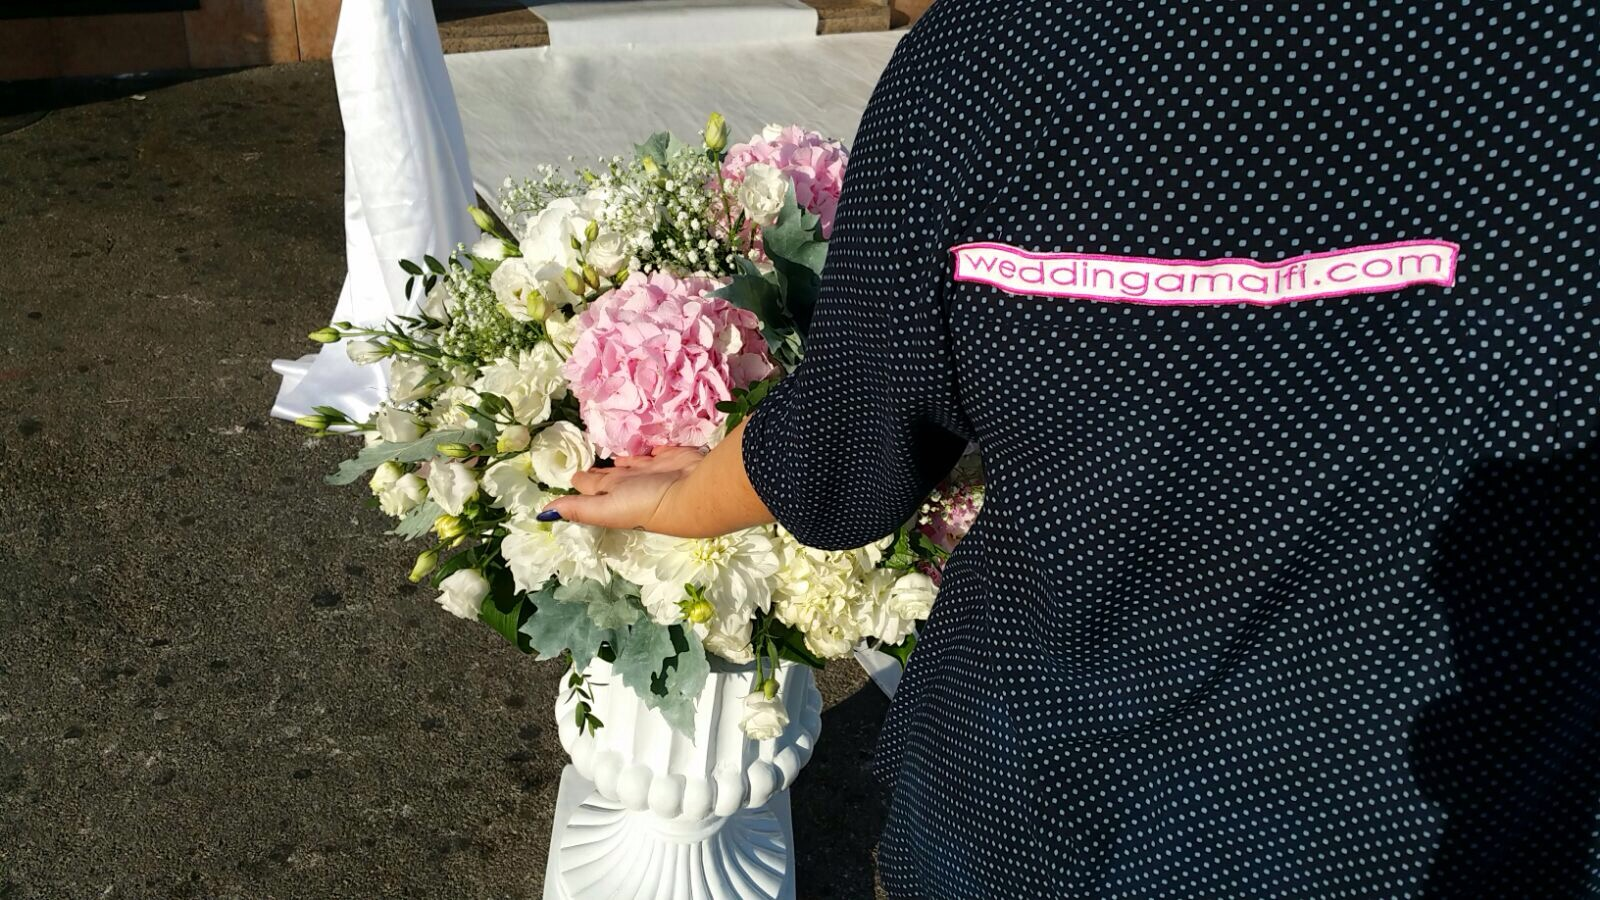 http://www.weddingamalfi.com/wp-content/uploads/Domenico-and-Maria-Wedding-Amalfi-staff-at-work-chairs-decoration.jpg